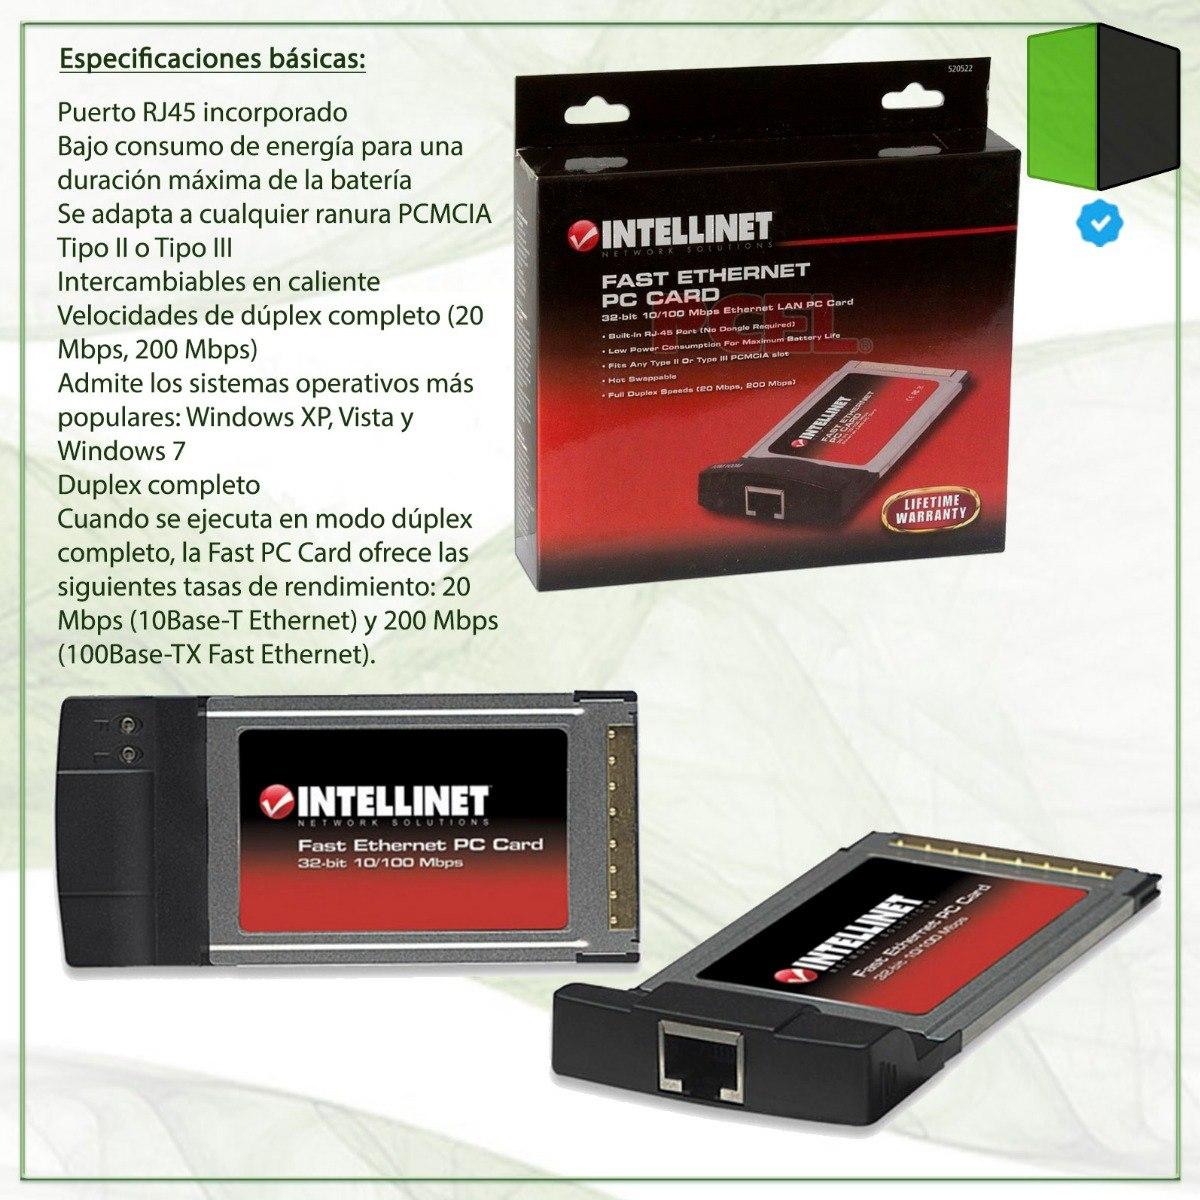 INTELLINET PCMCIA 10100 NETWORK CARD DRIVER